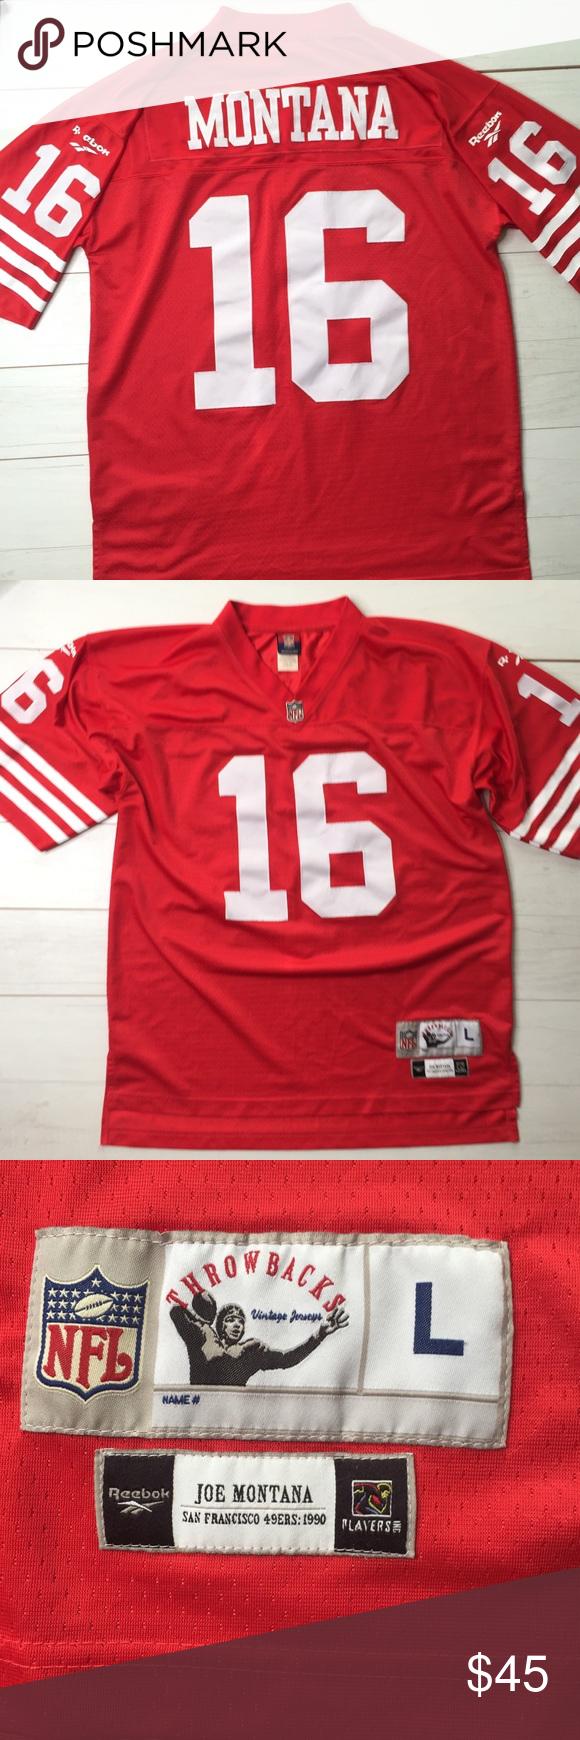 1ee51b950 Joe Montana 49ers Jersey Reebok Sewn Numbers Sz L Joe Montana Jersey Sz  Large Reebok throwback on field sewn numbers + decals reebok see pic one  reebok is ...